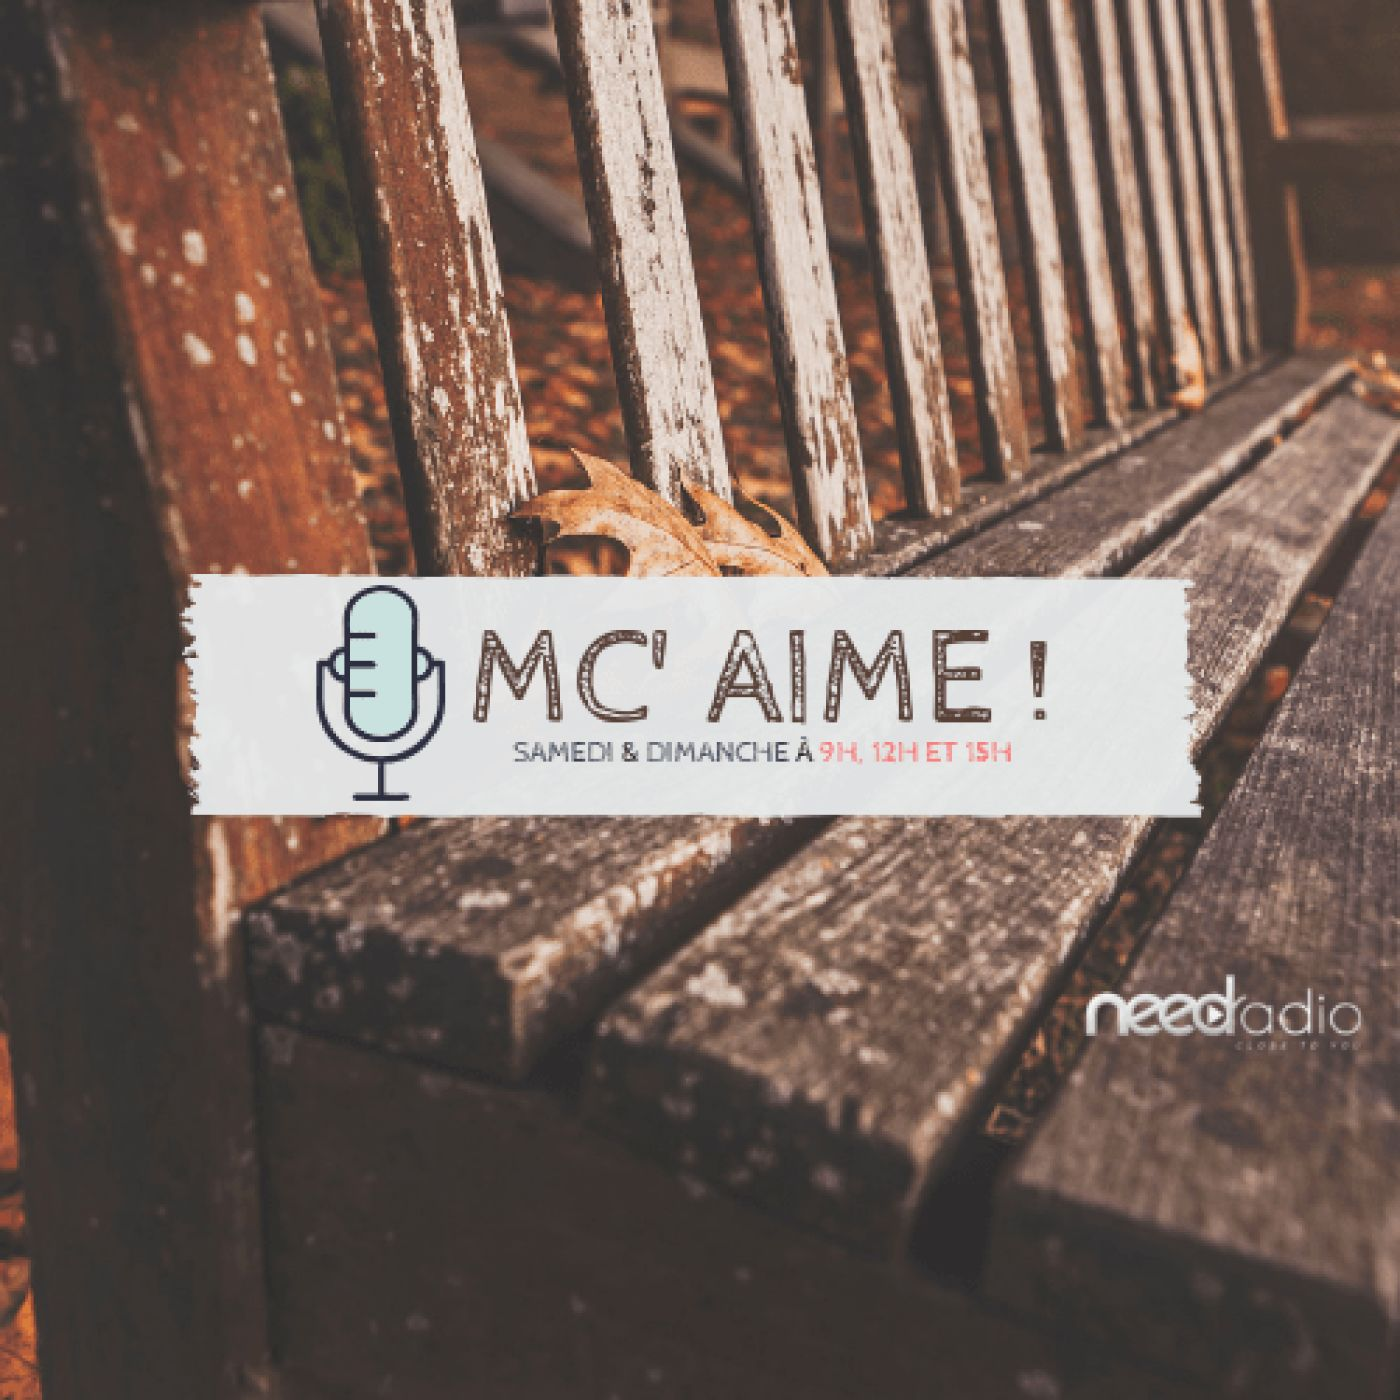 MC' Aime - Le festival d'Avignon (29/06/19)